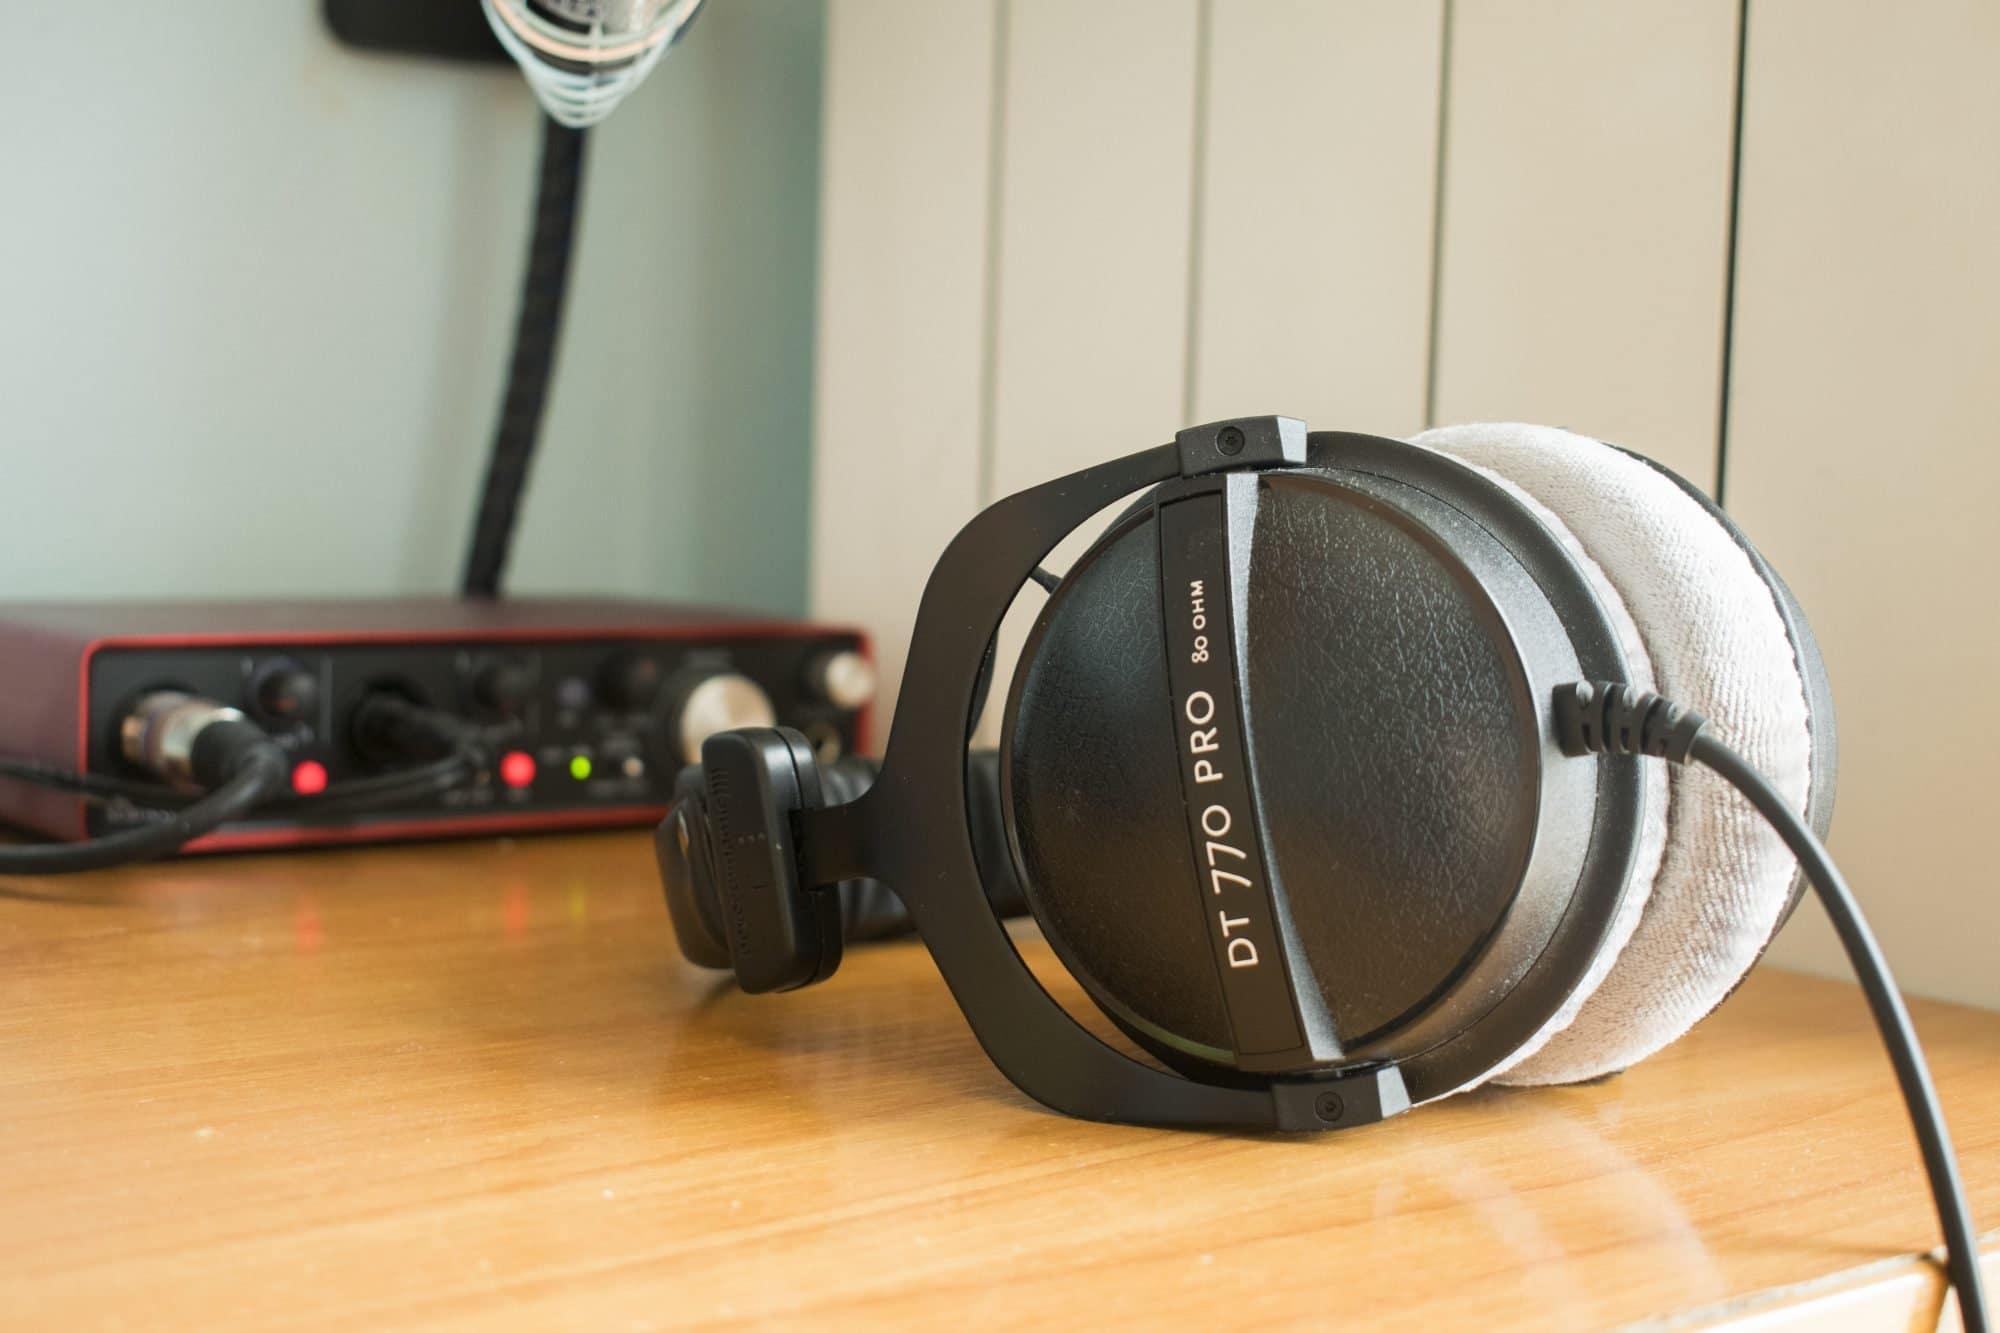 Headphones Beyerdynamic DT 770 PRO in a croatian voiceover studio on desk